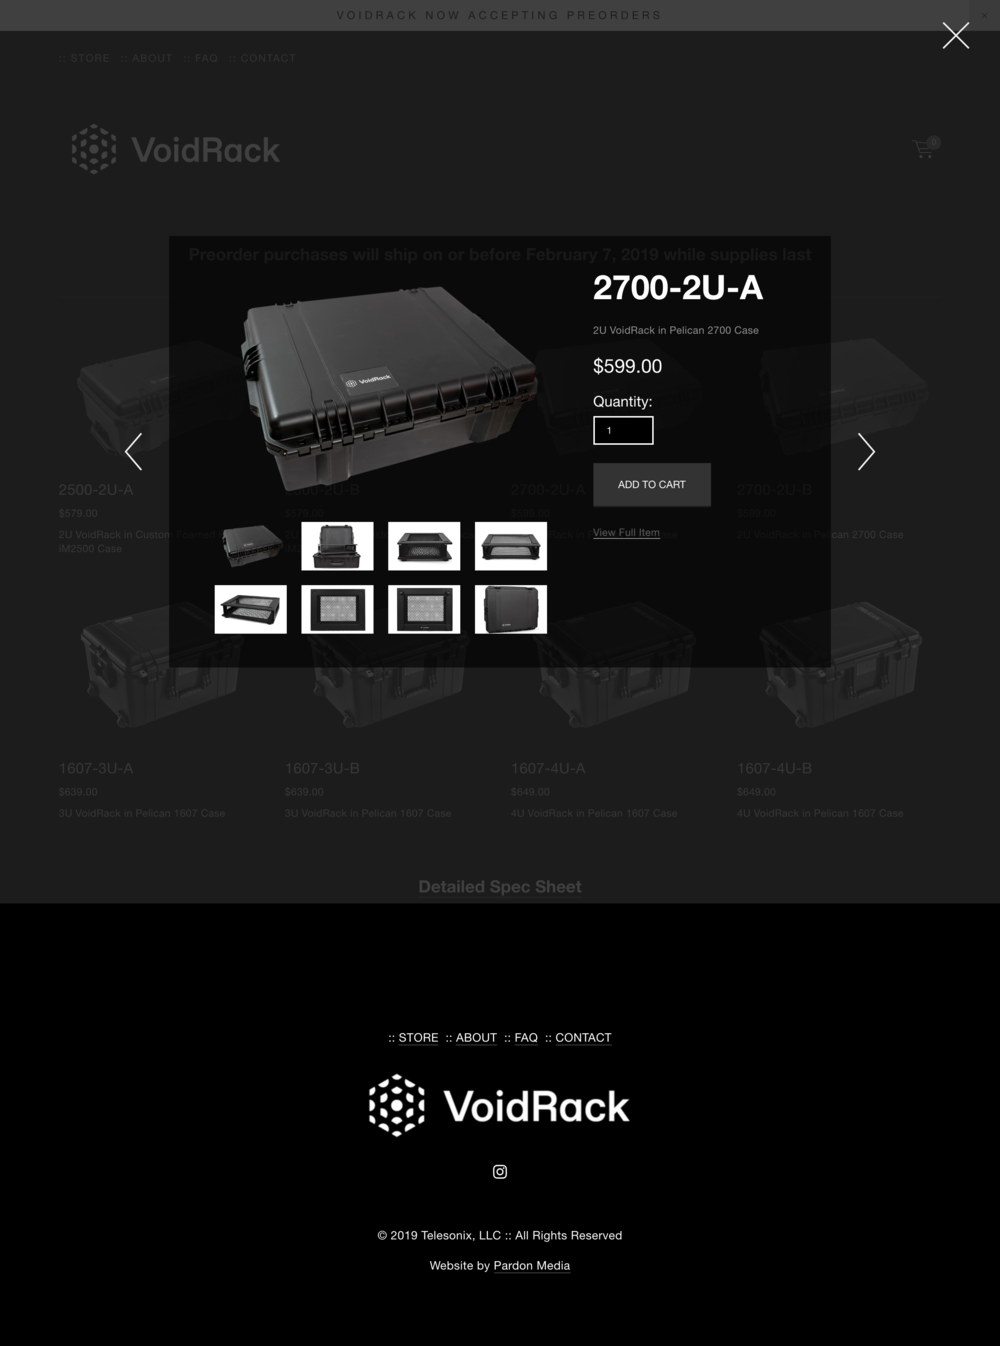 screencapture-voidrack-store-2018-12-23-21_11_32.png